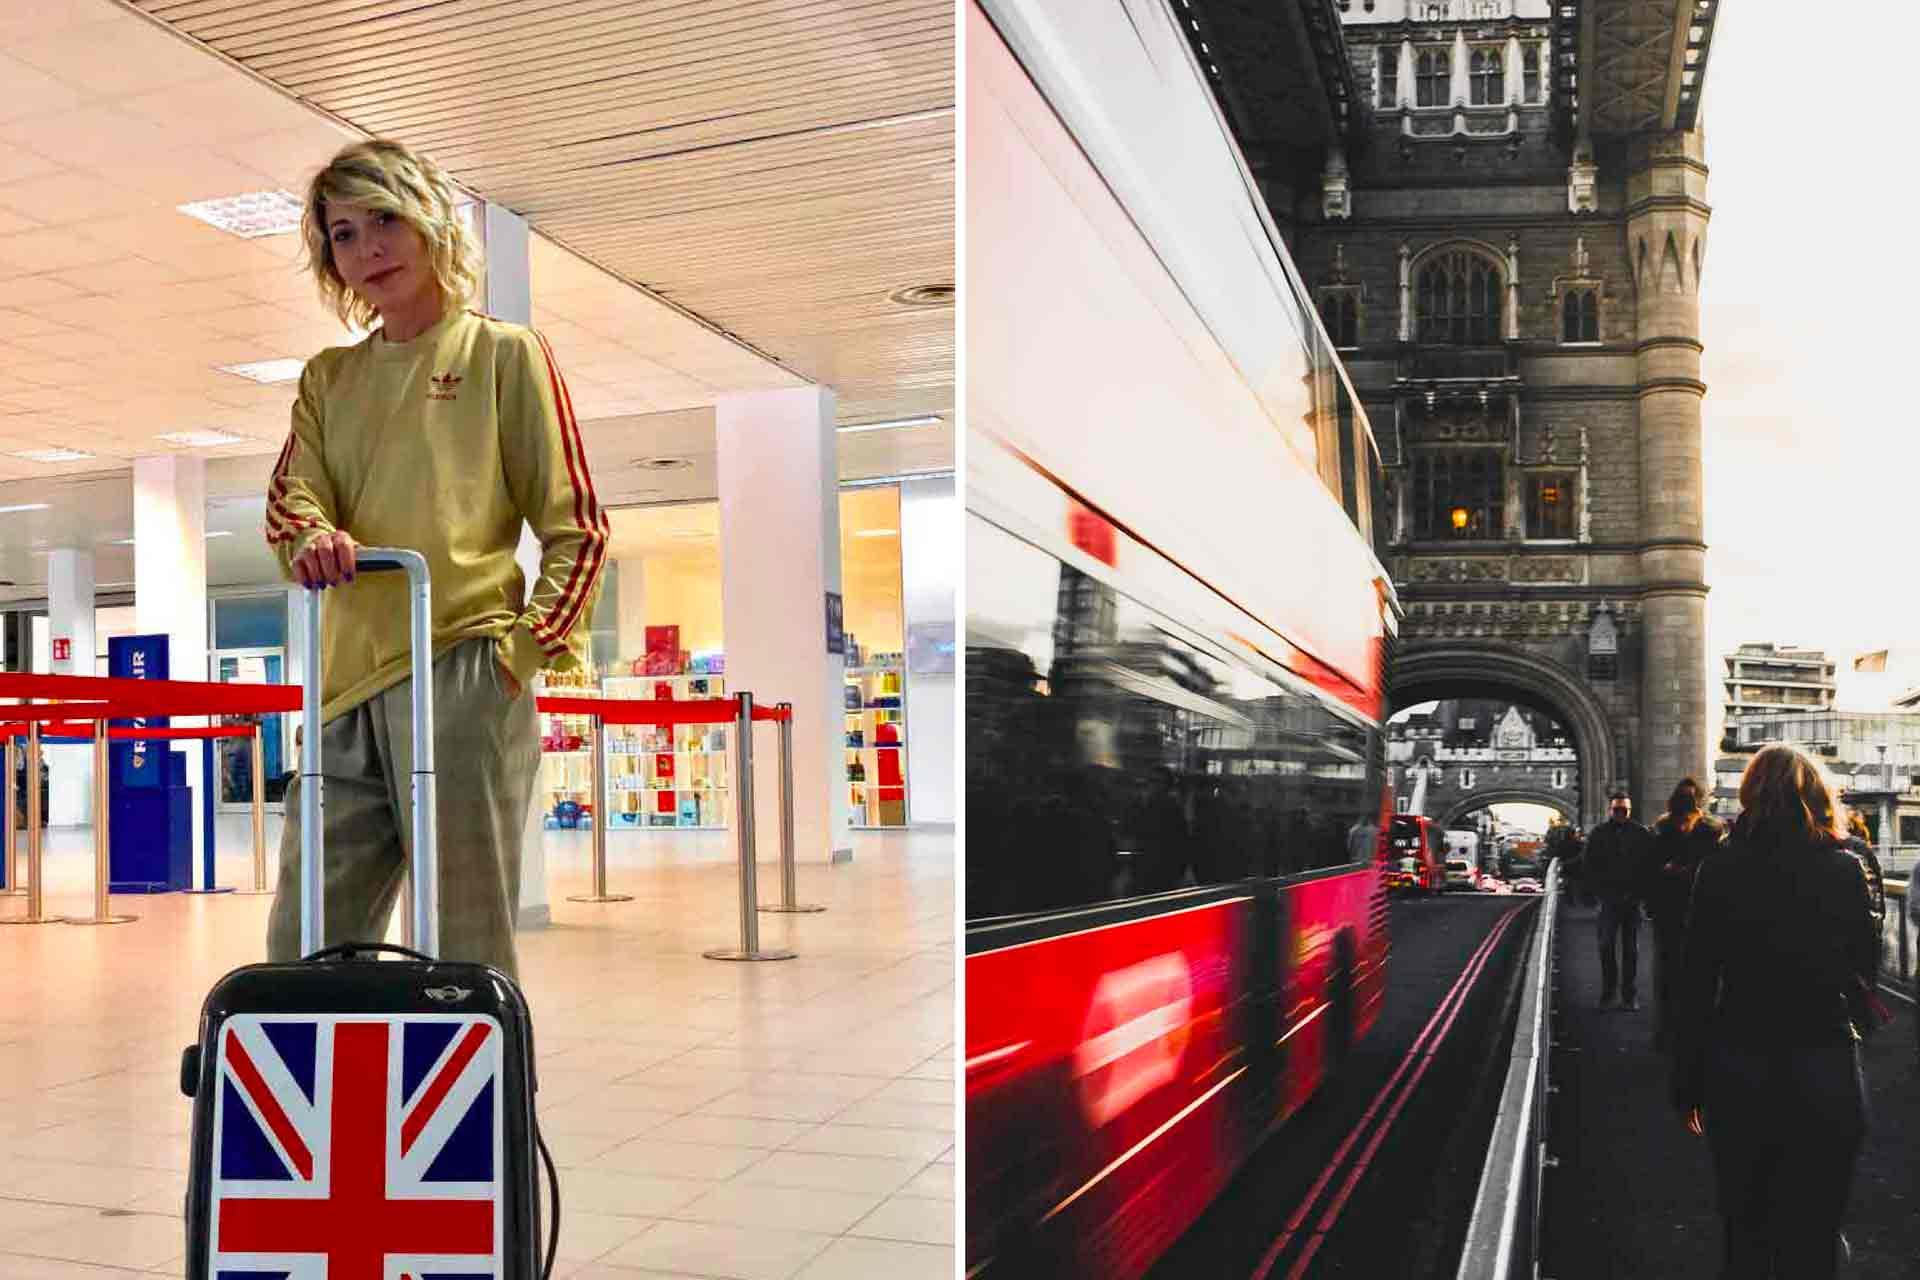 Londra Consigli Di Viaggio Di Una Ex Londoner|Mini Guida Per Un Weekend